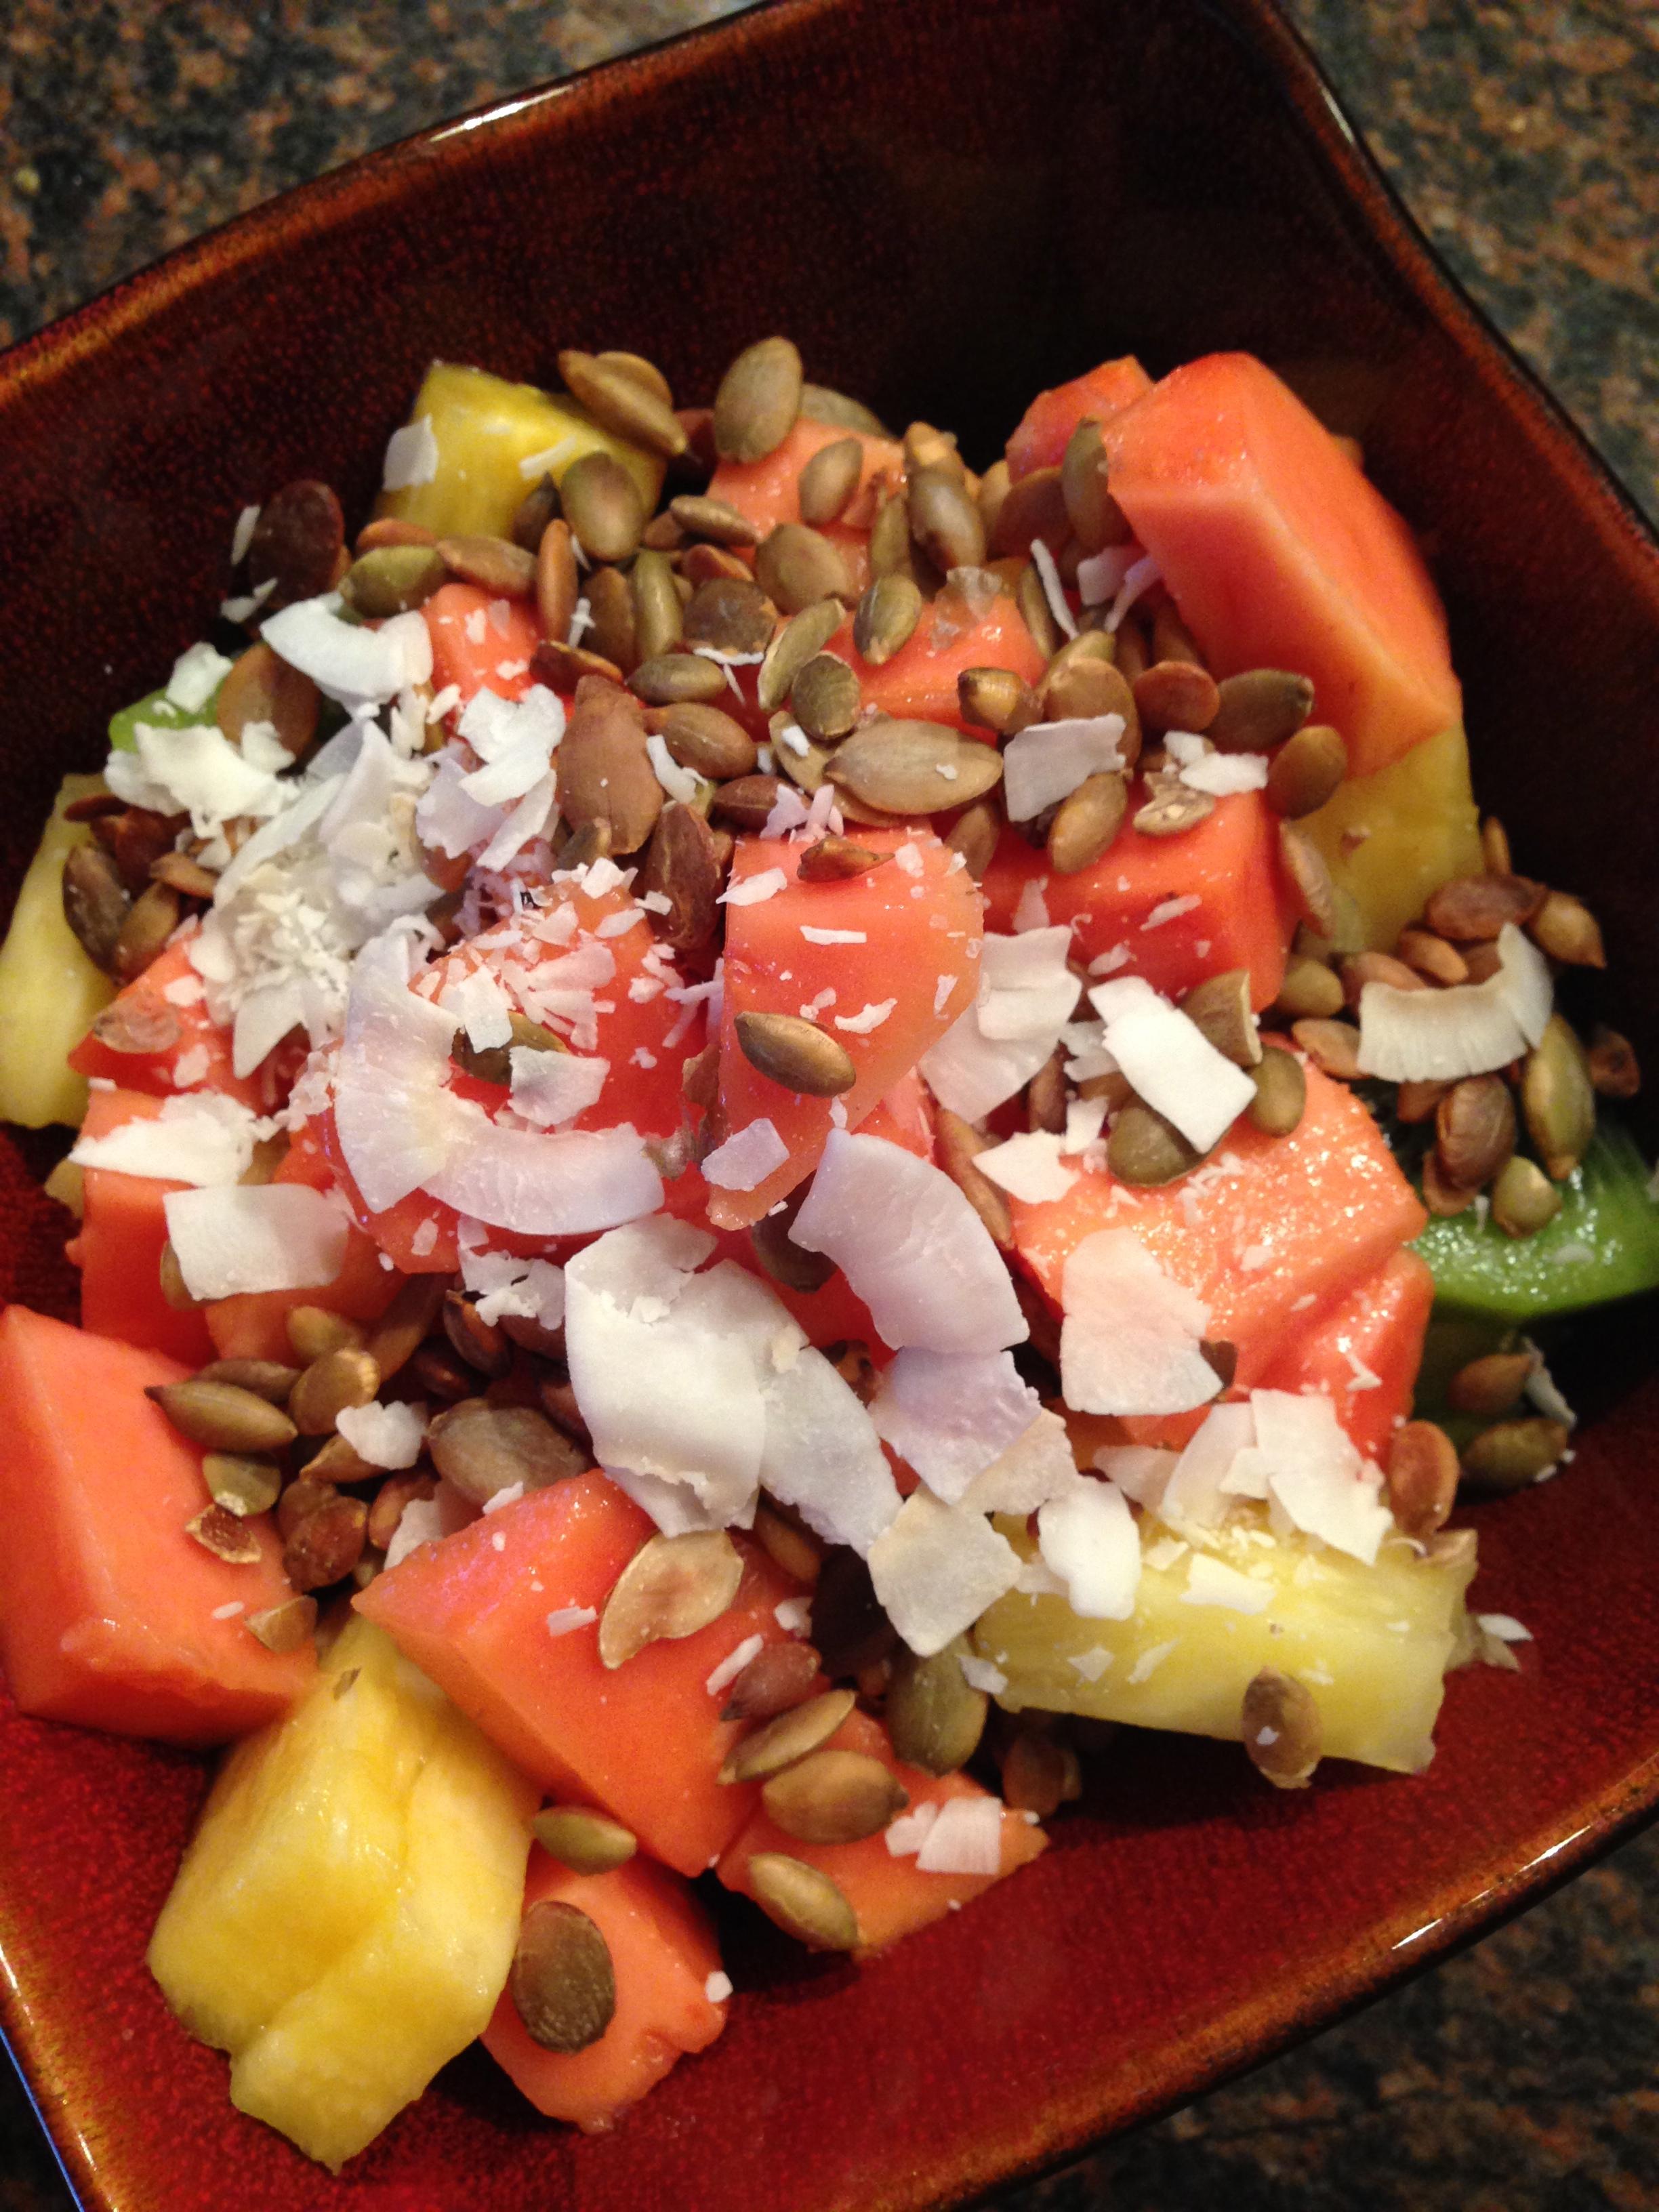 vegan recipes, vegan breakfast, clean eats, eat clean, recipes, motivation, food, healthy, yummy food